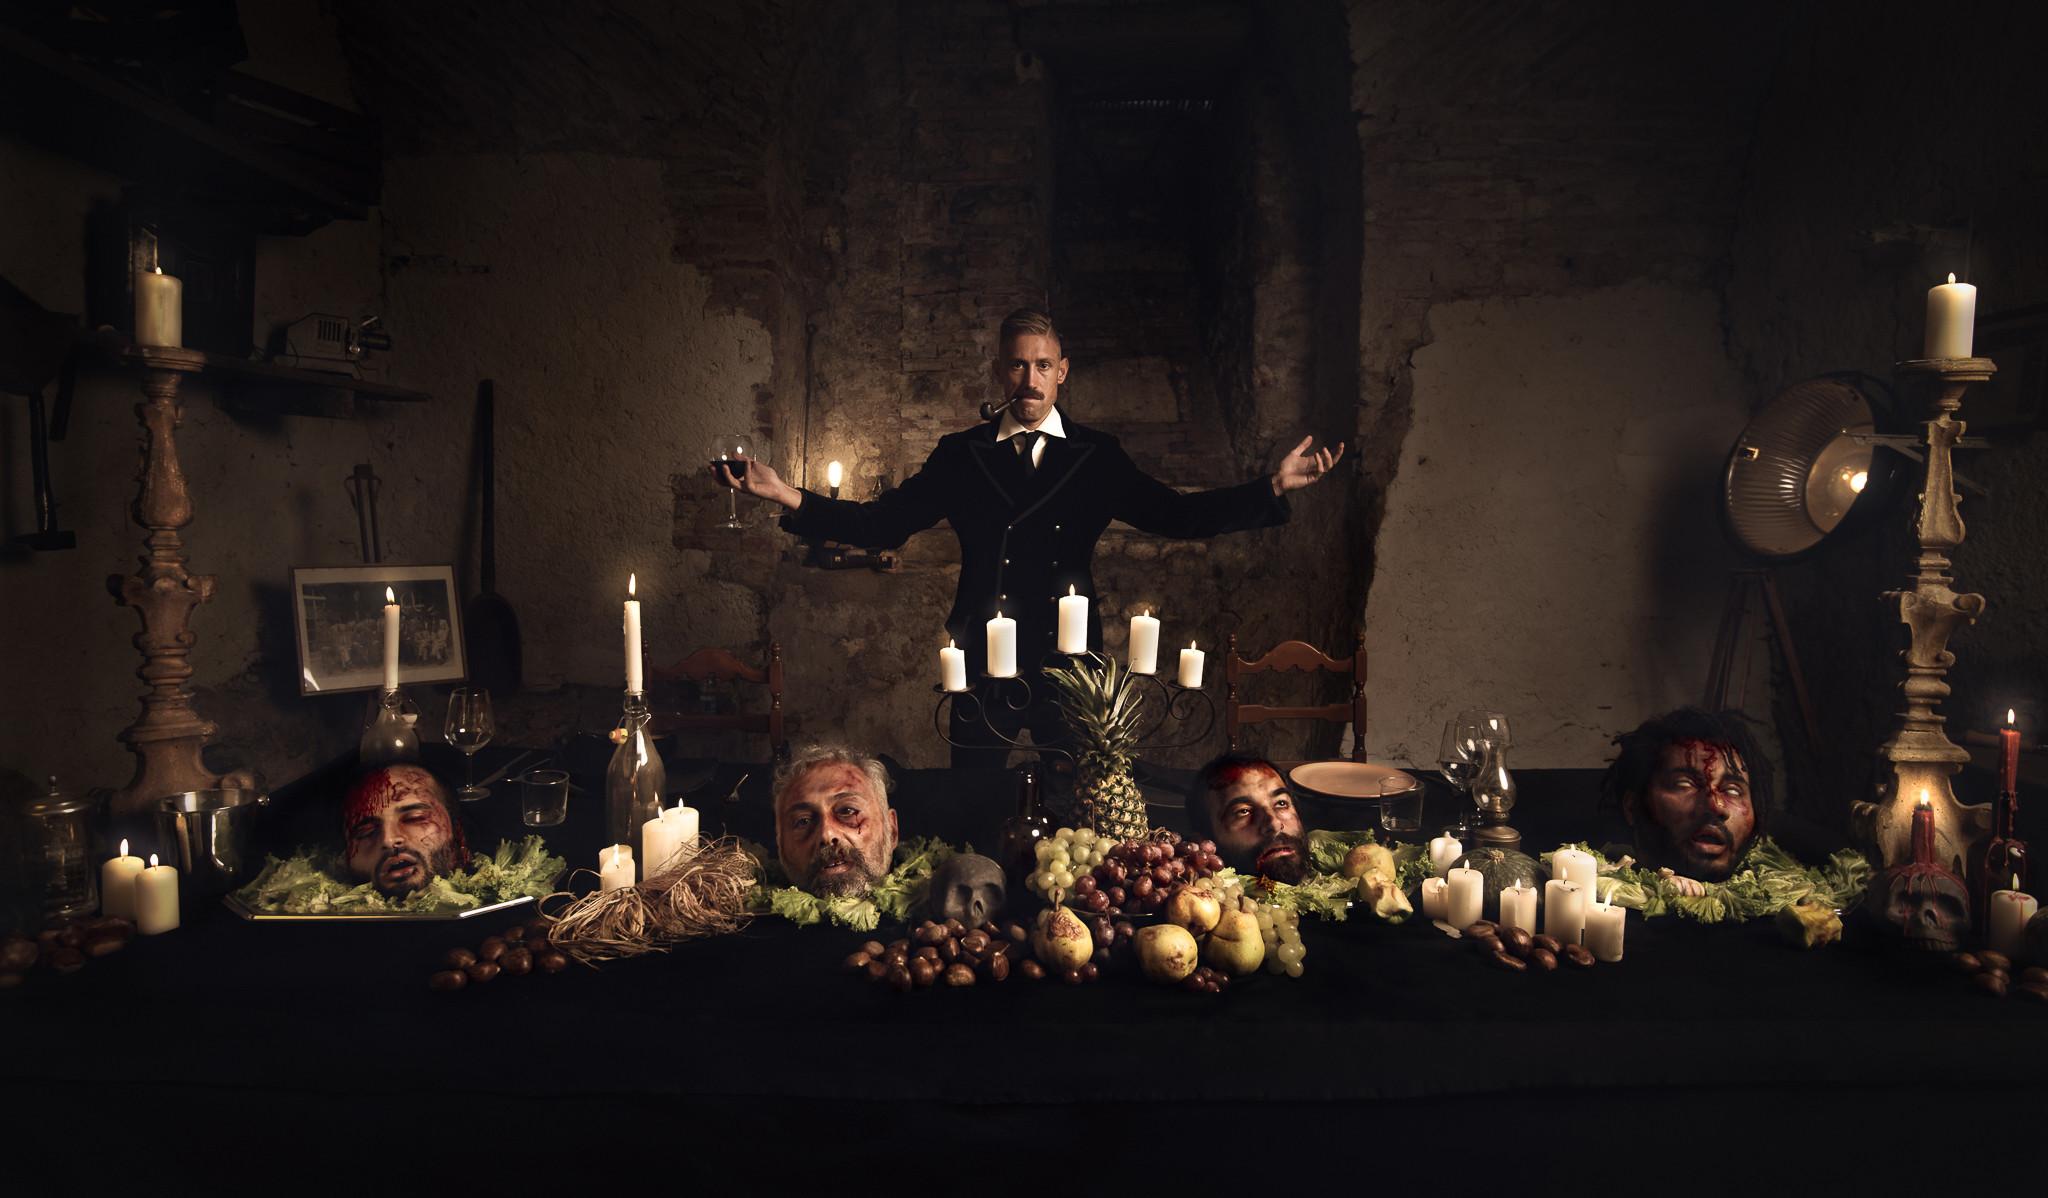 Dark commercial photoshoot